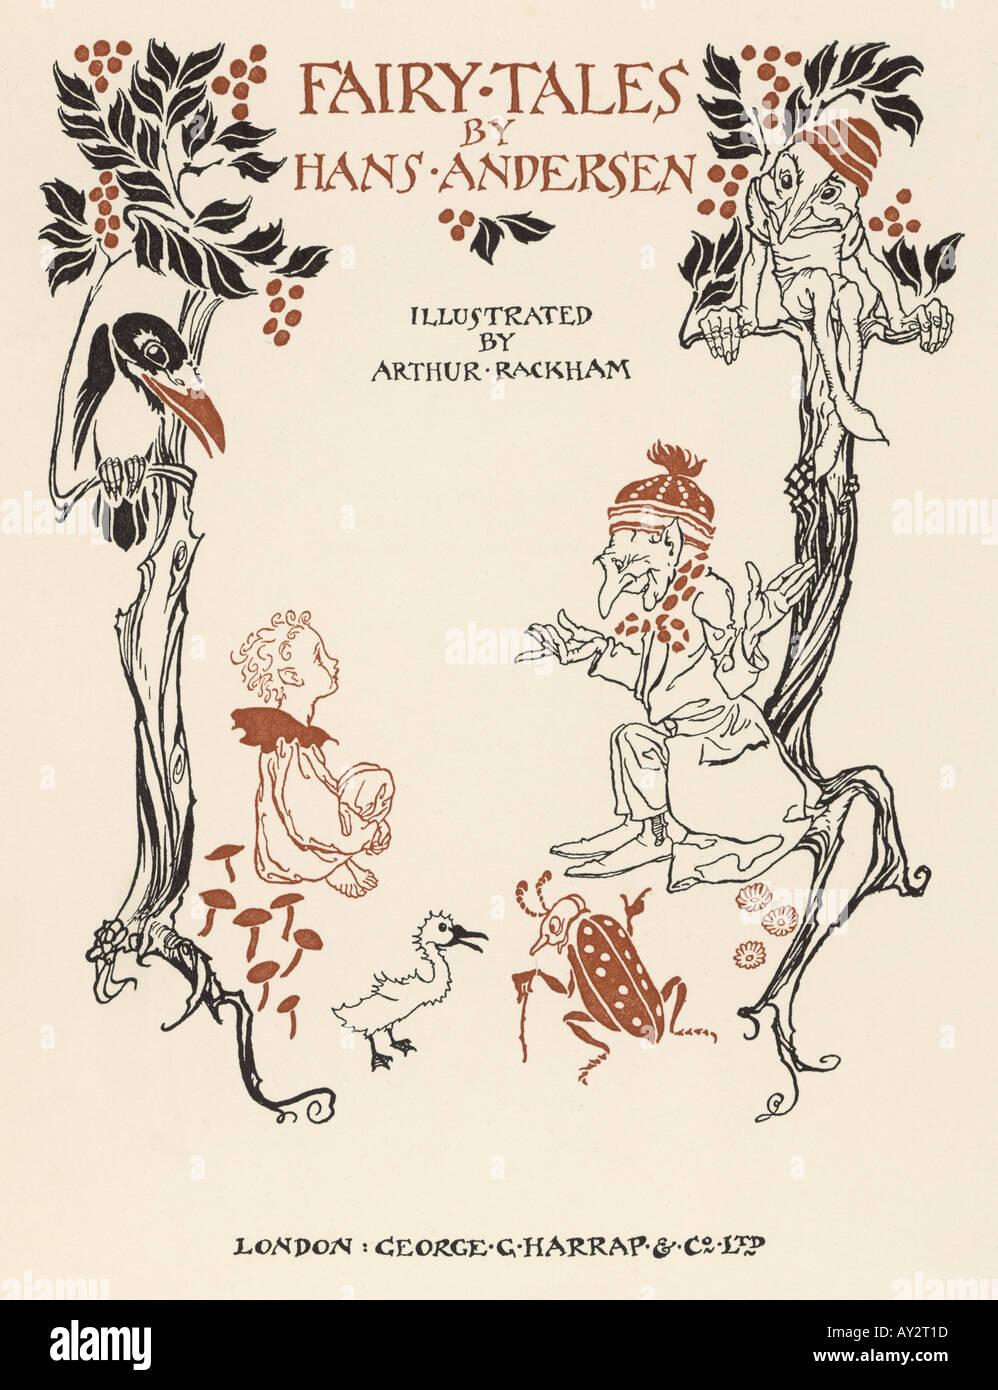 Andersen Fairy Tales - Stock Image